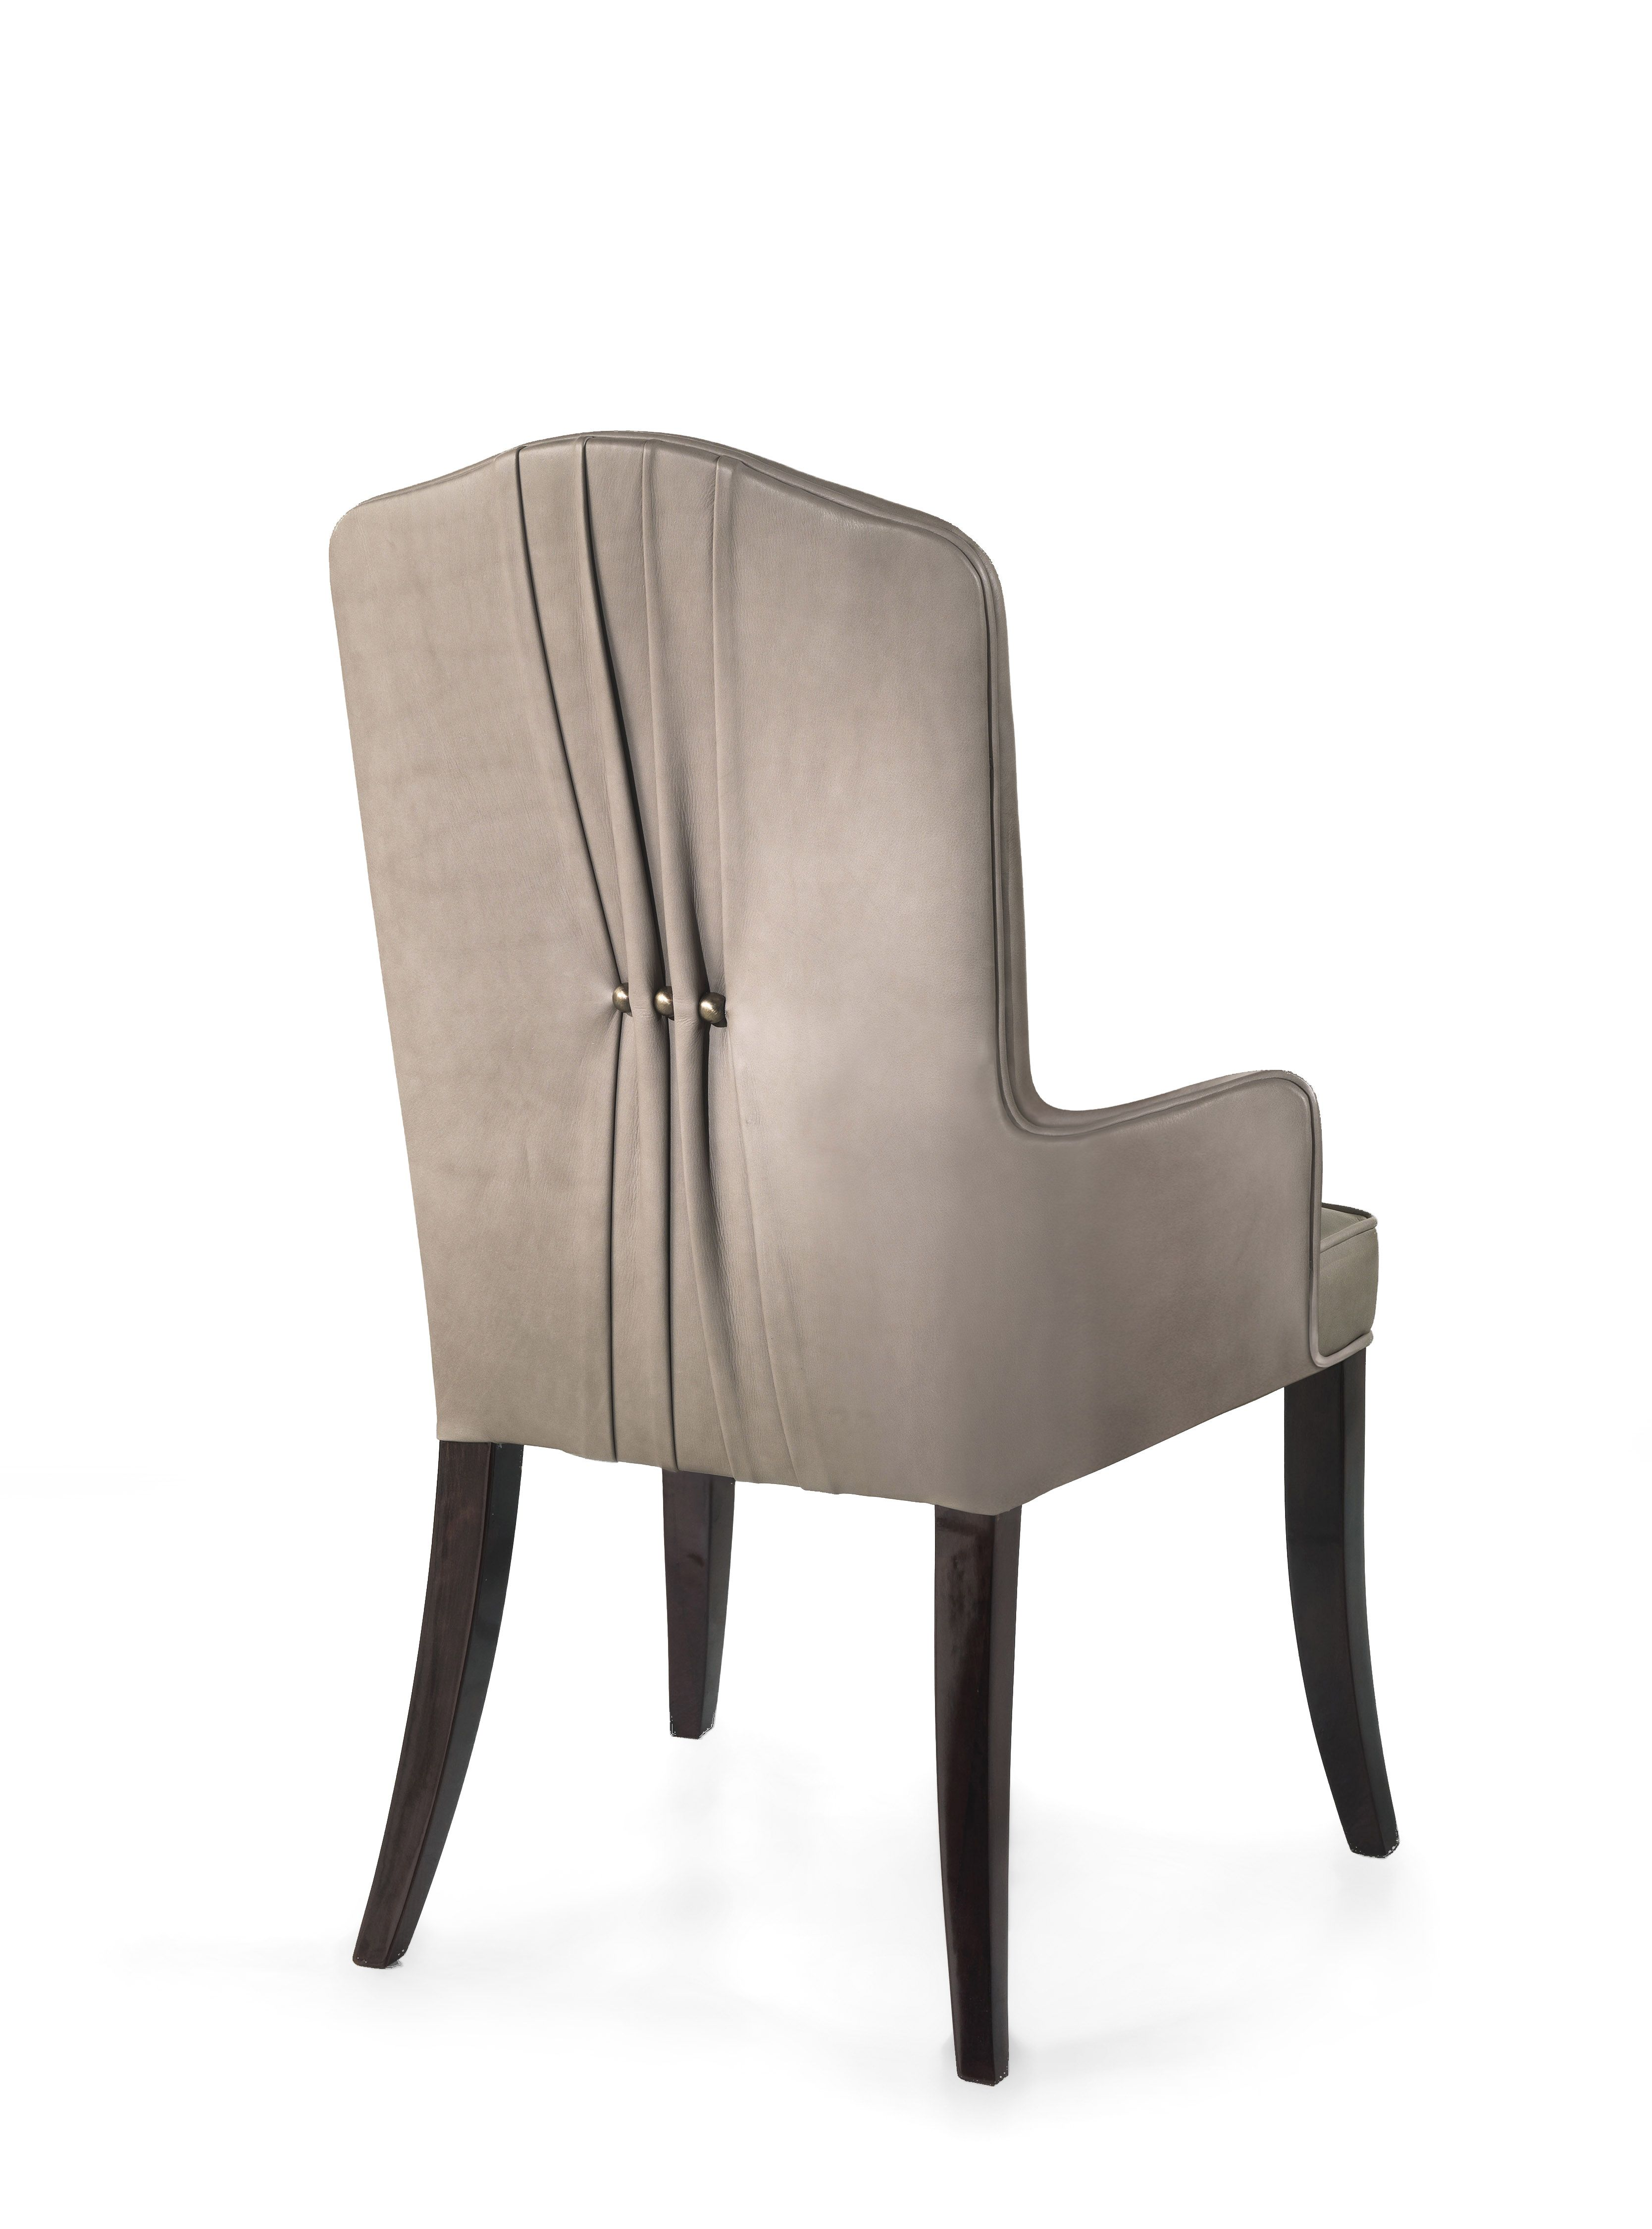 Roberto Cavalli Sharpei Chair Back Designblog Luxurydesign Armchair Furniture Dining Chairs Furniture Chair